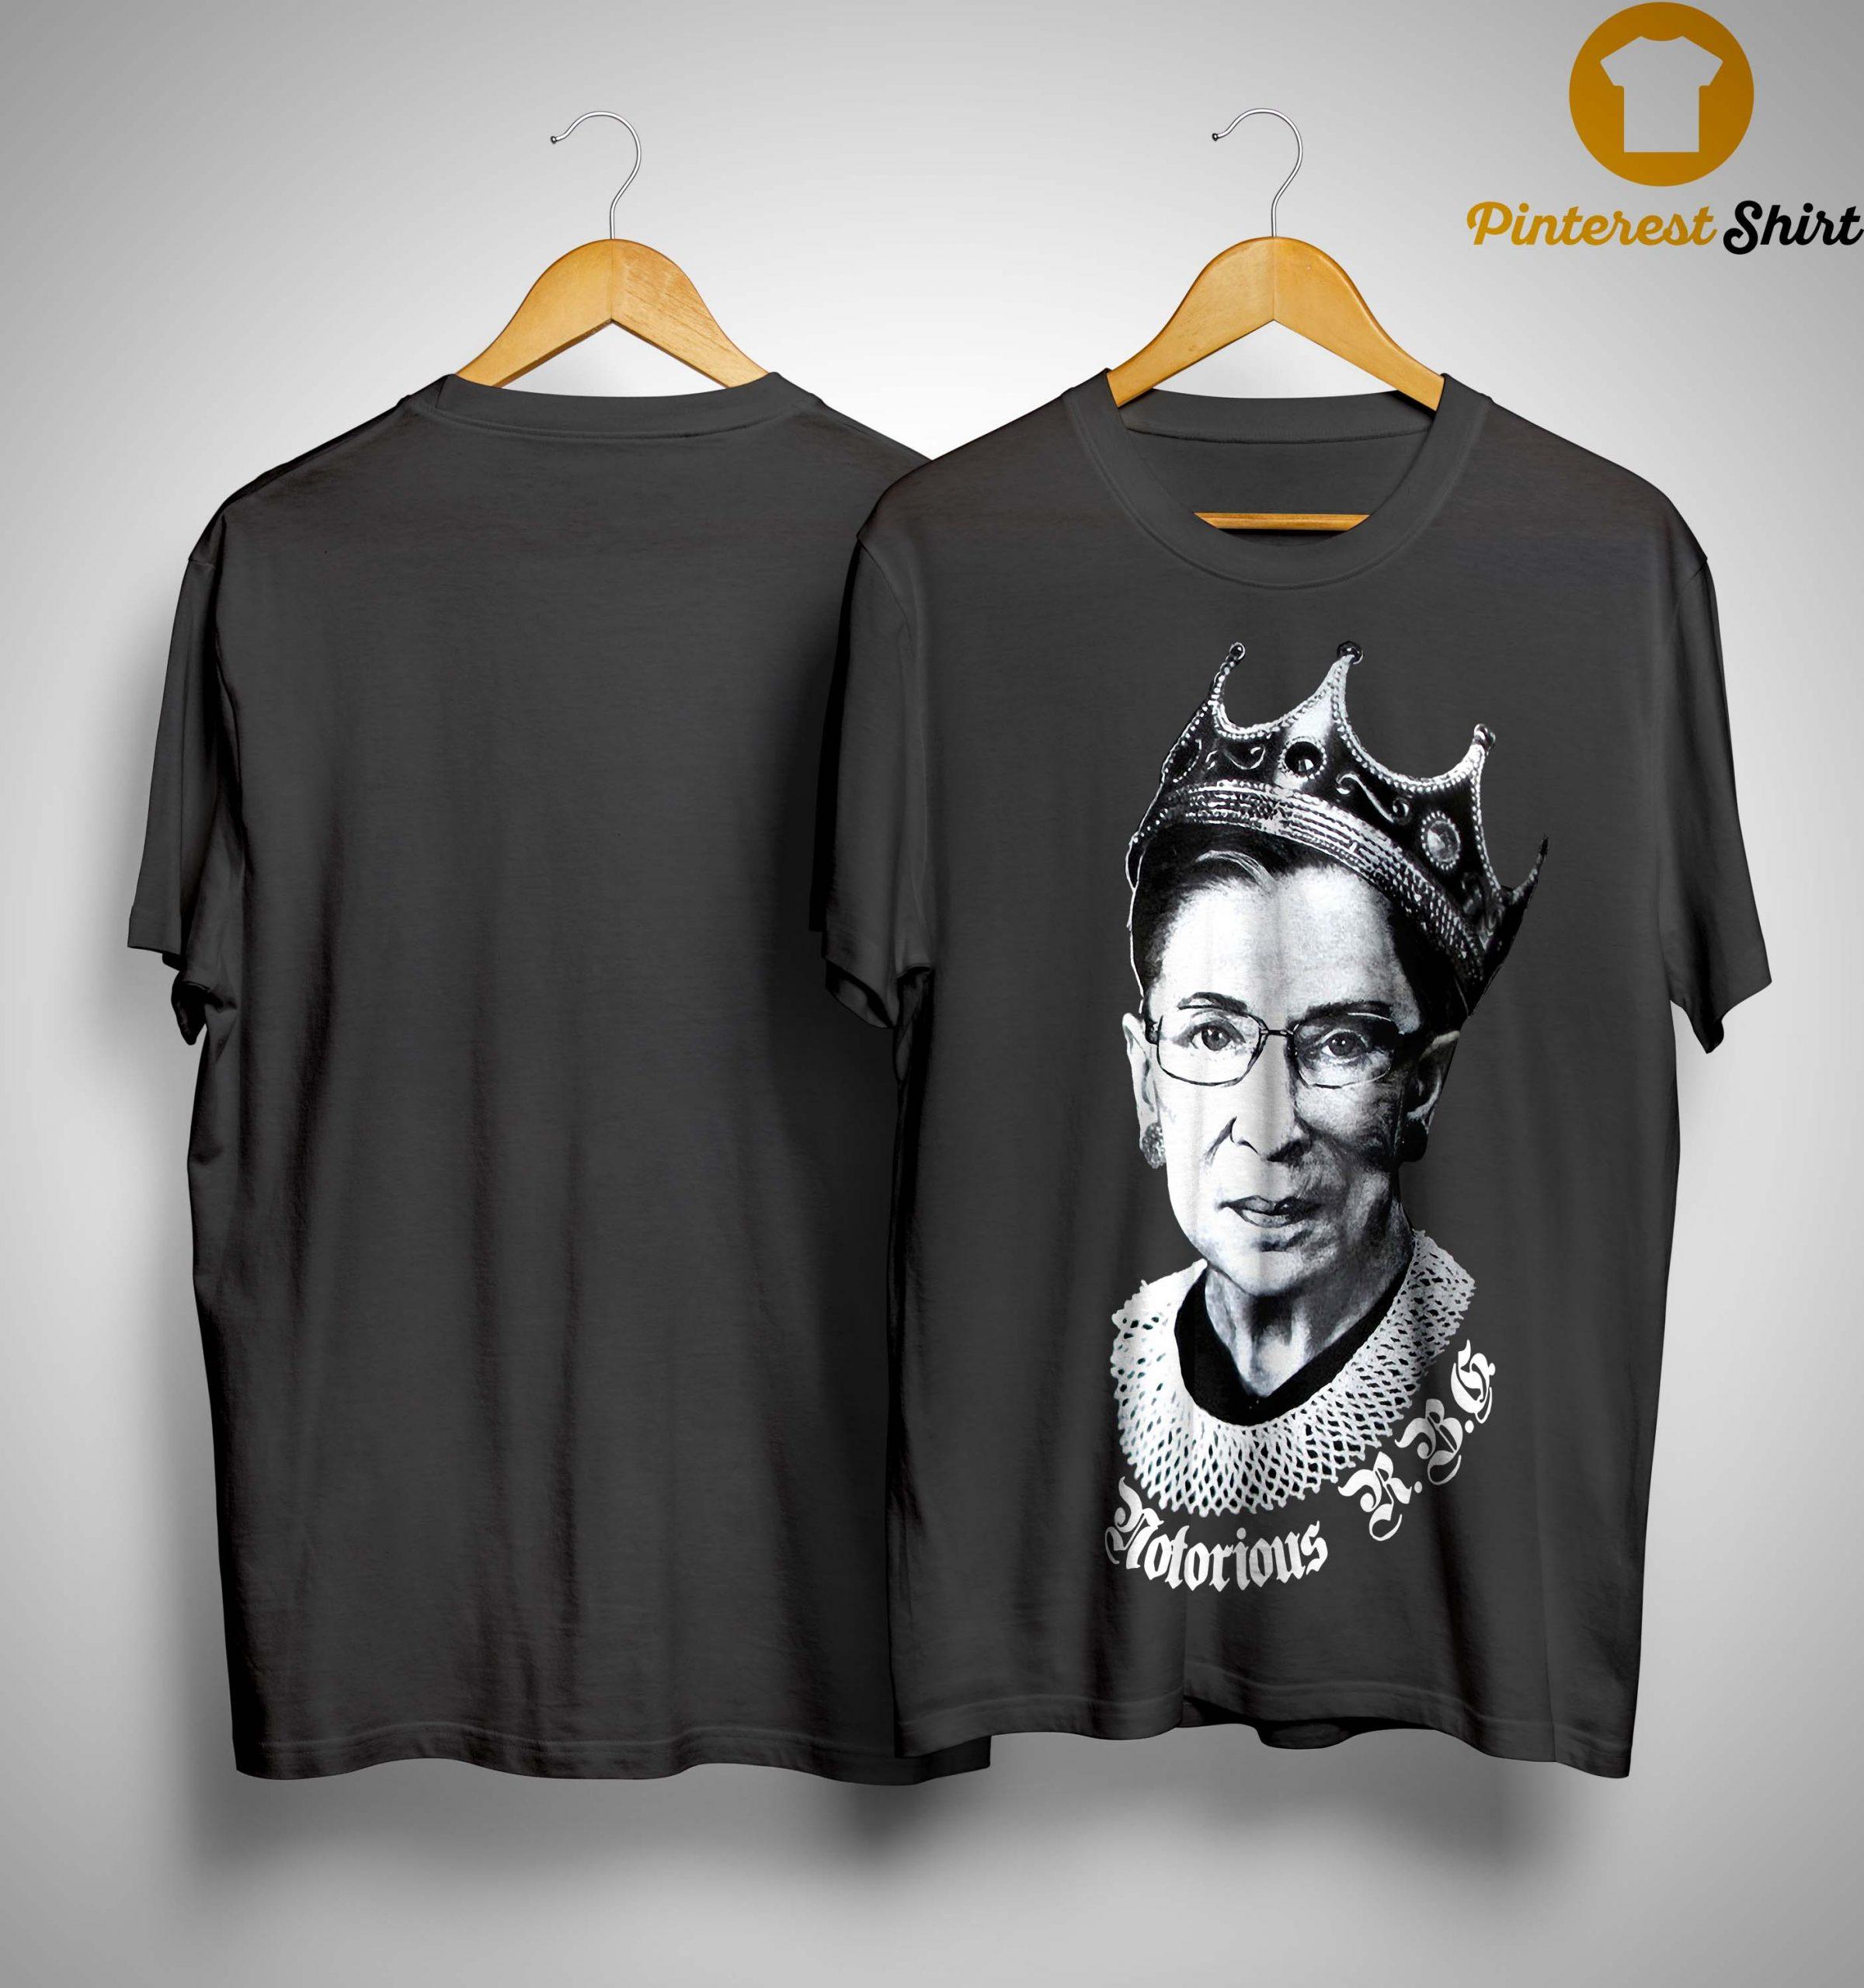 Pop Culture Icon Notorious Rbg Sweatshirt